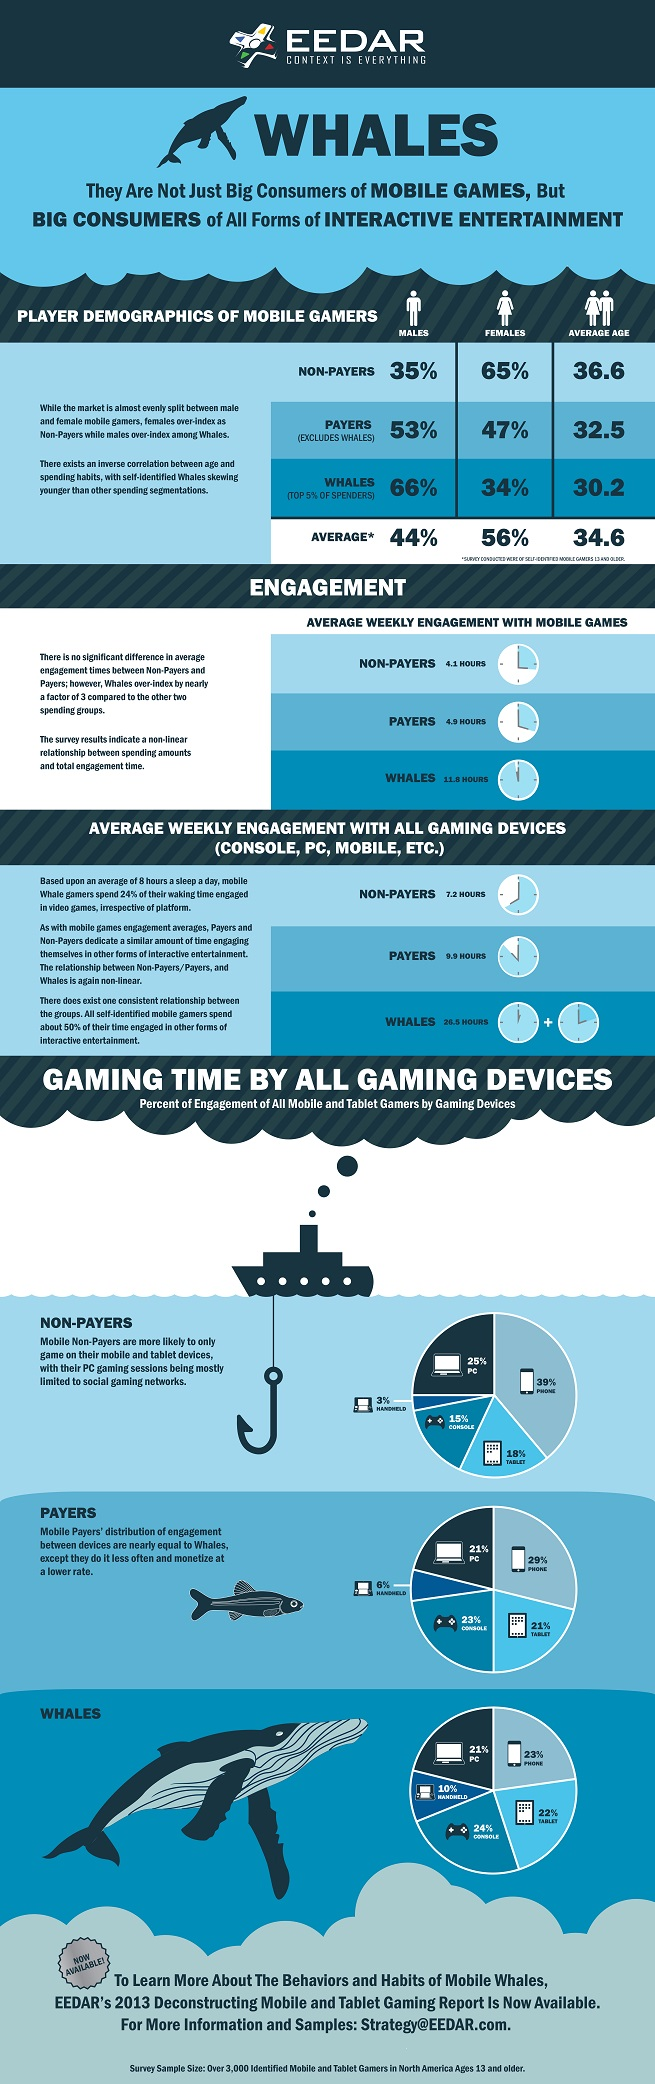 EEDAR mobile gaming infographic